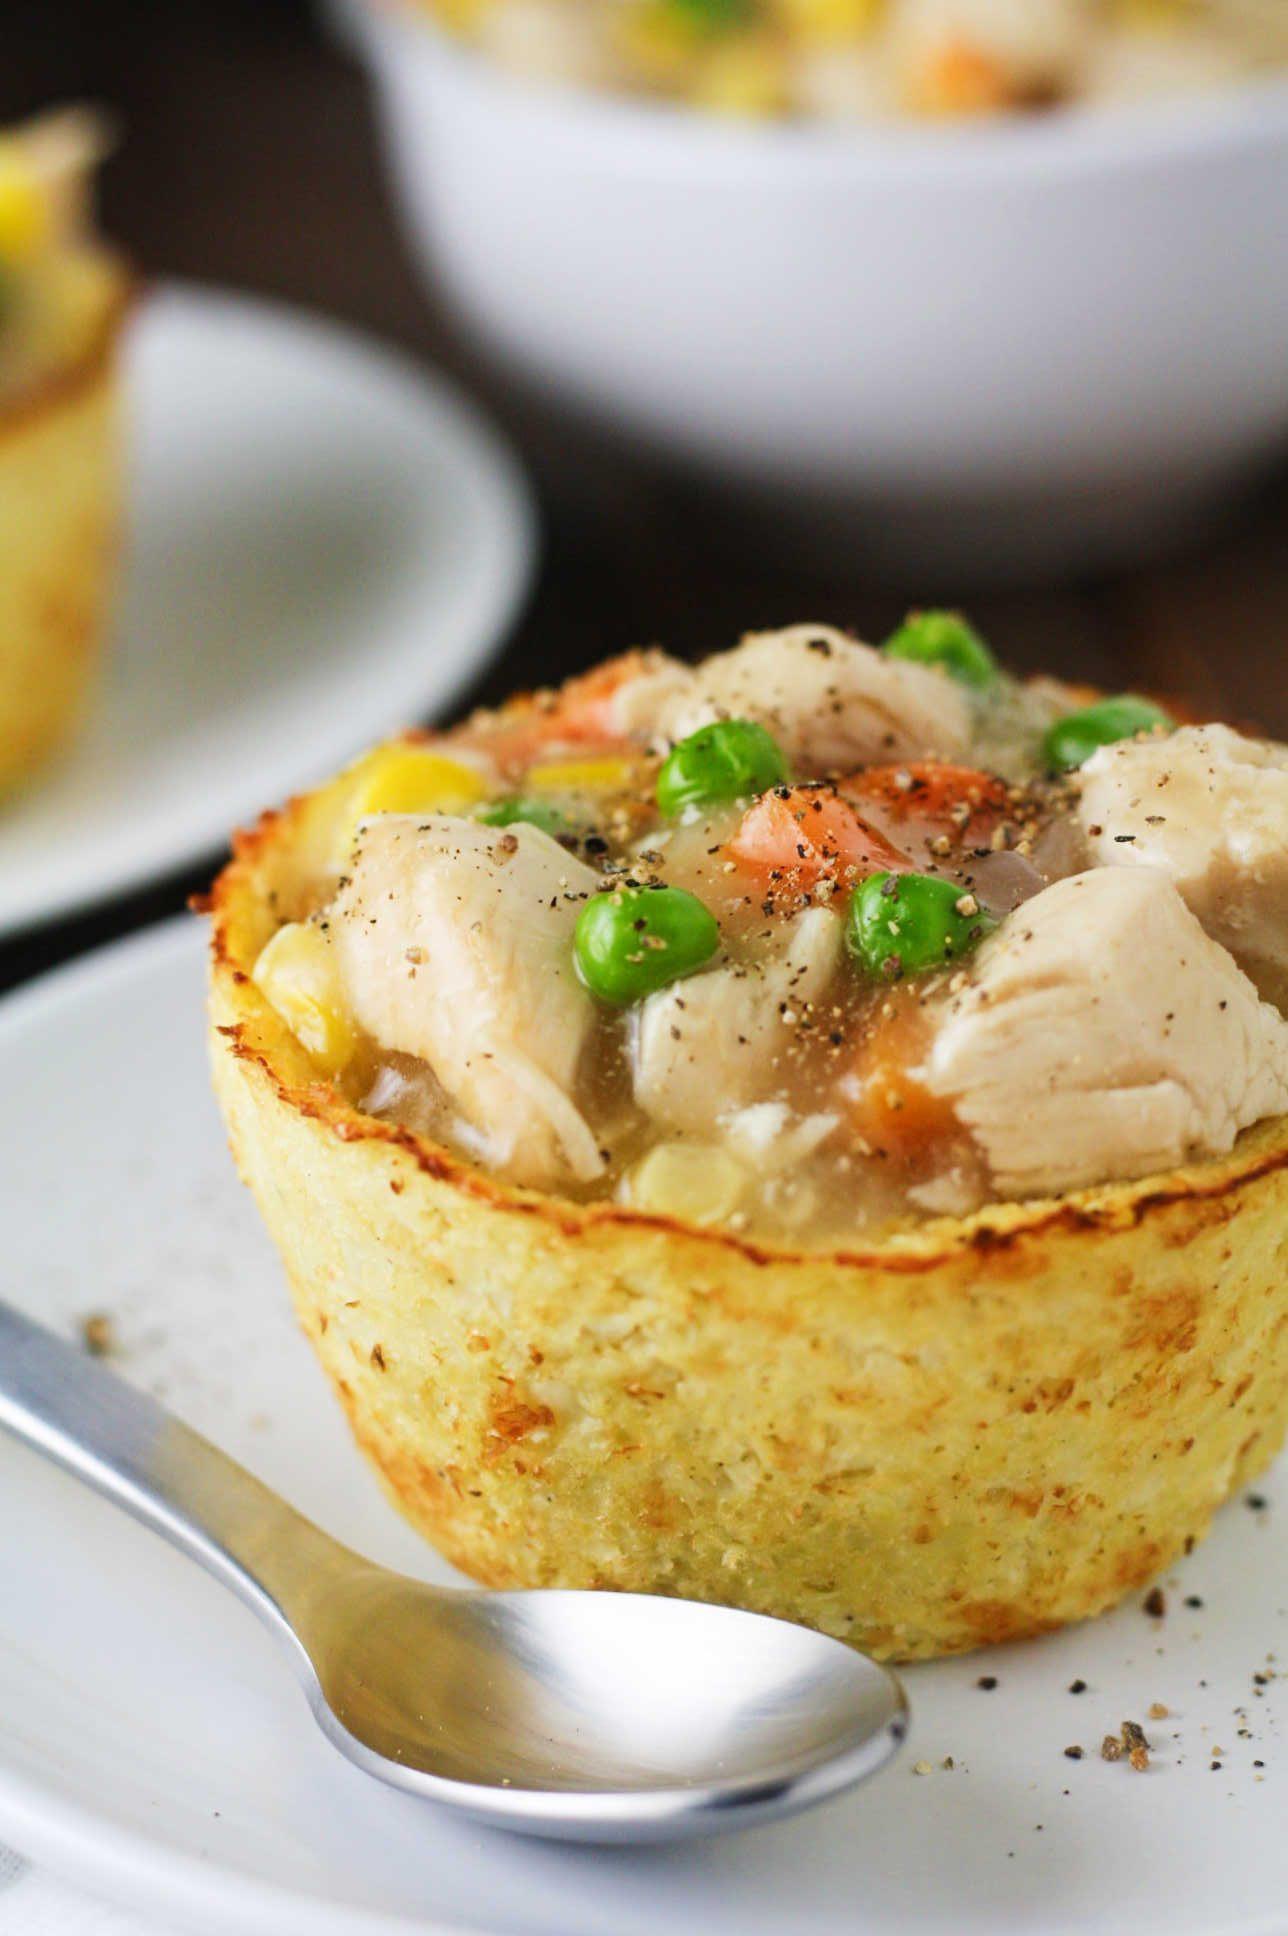 Low Fat Cauliflower Recipes  Low Carb Cauliflower Pot Pies It s Cheat Day Everyday